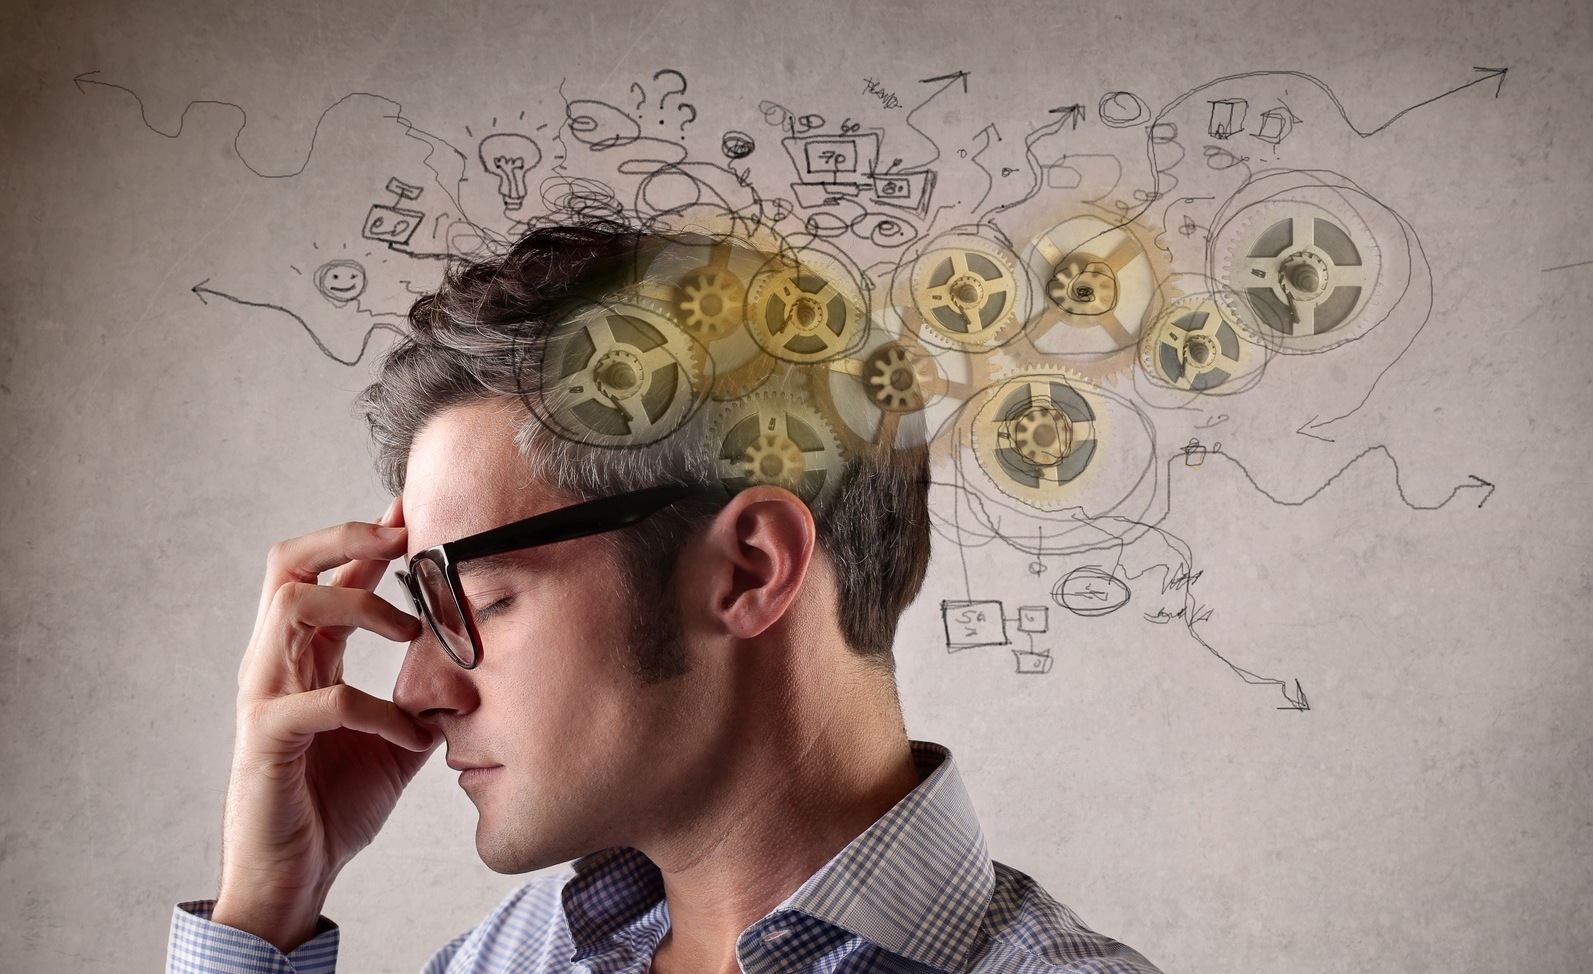 Inteligencja emocjonalna kluczem do sukcesu inteligencja emocjonalna inteligencja emocjonalna mediarun com